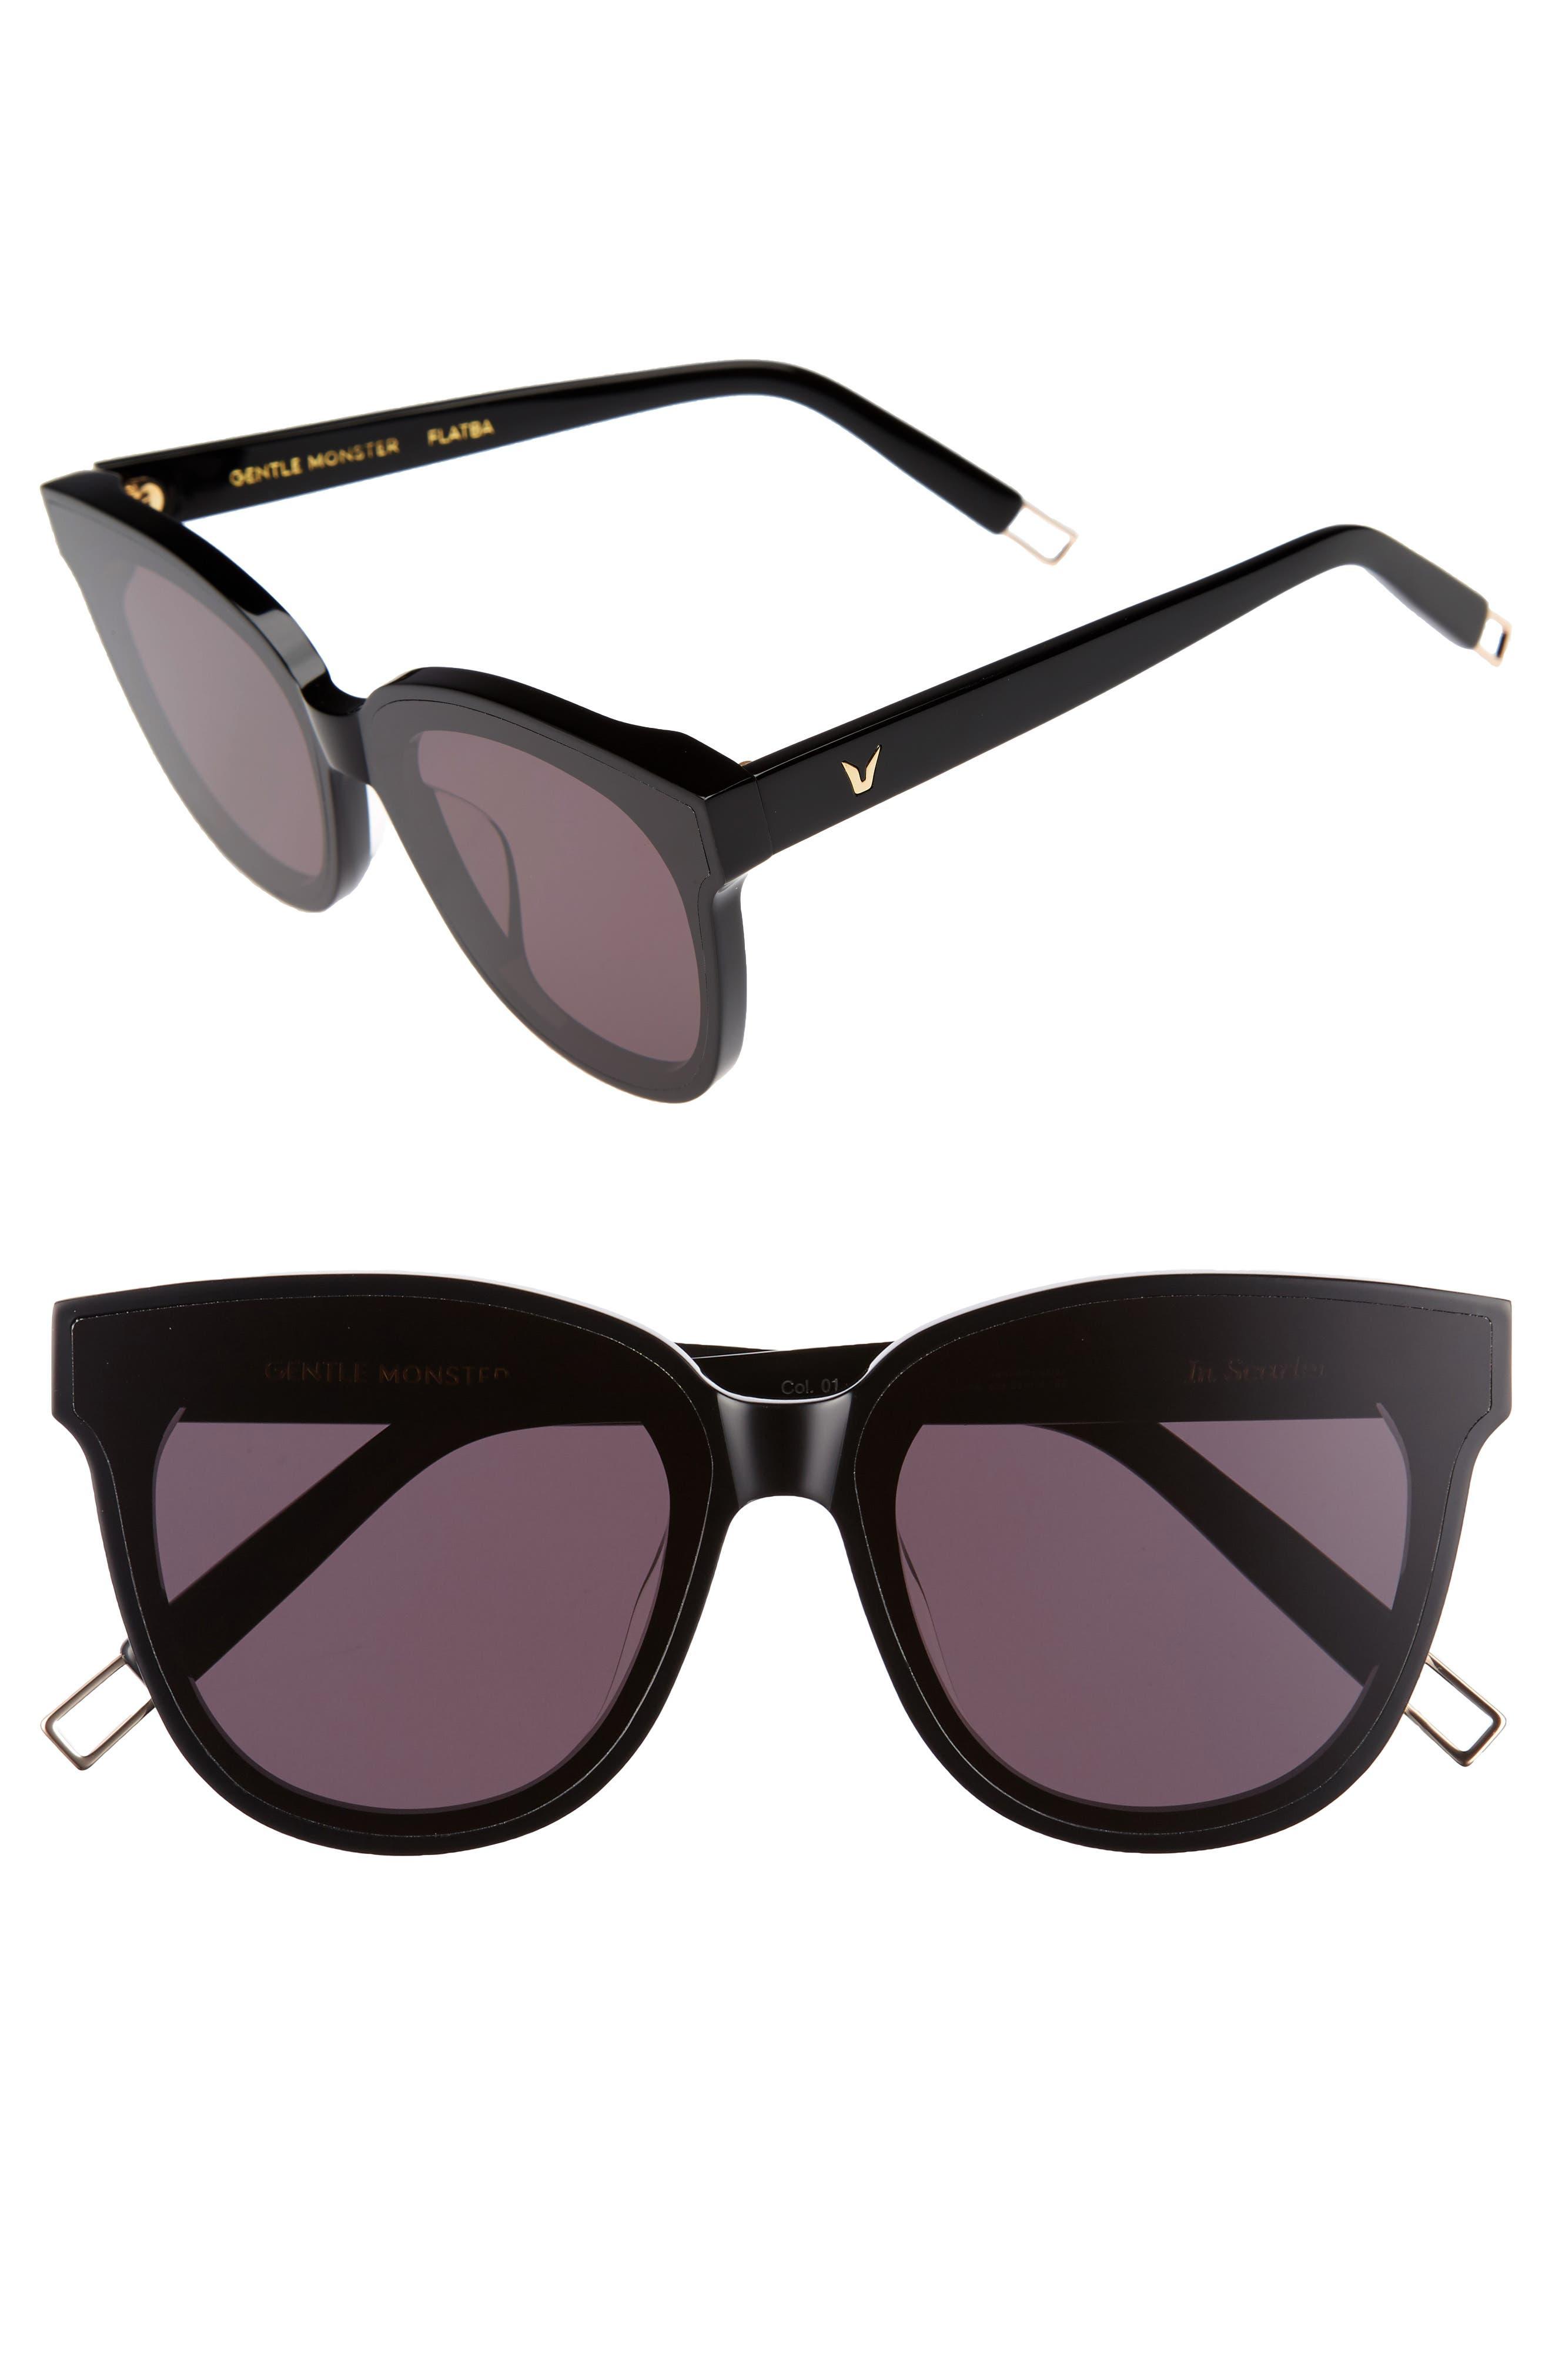 Main Image - Gentle Monster In Scarlet 68mm Oversize Cat Eye Sunglasses